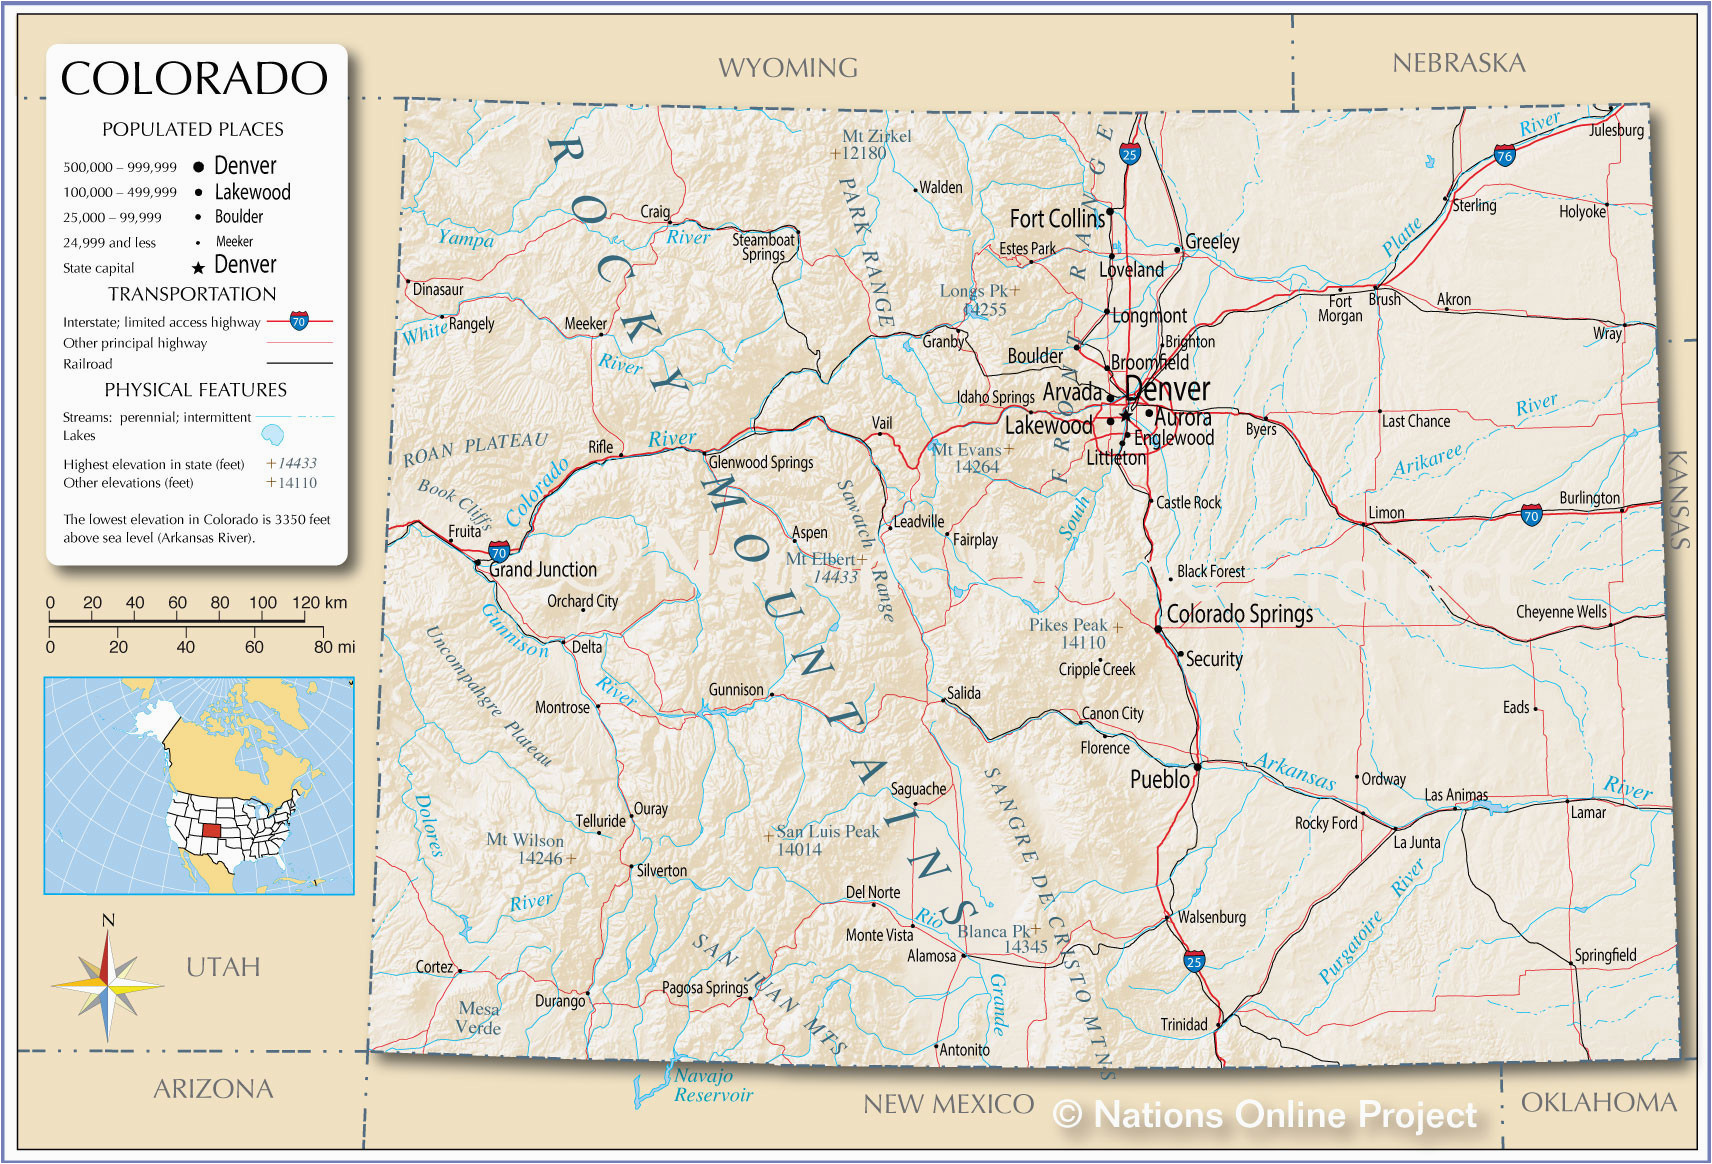 colorado mountains map fresh colorado county map with roads fresh